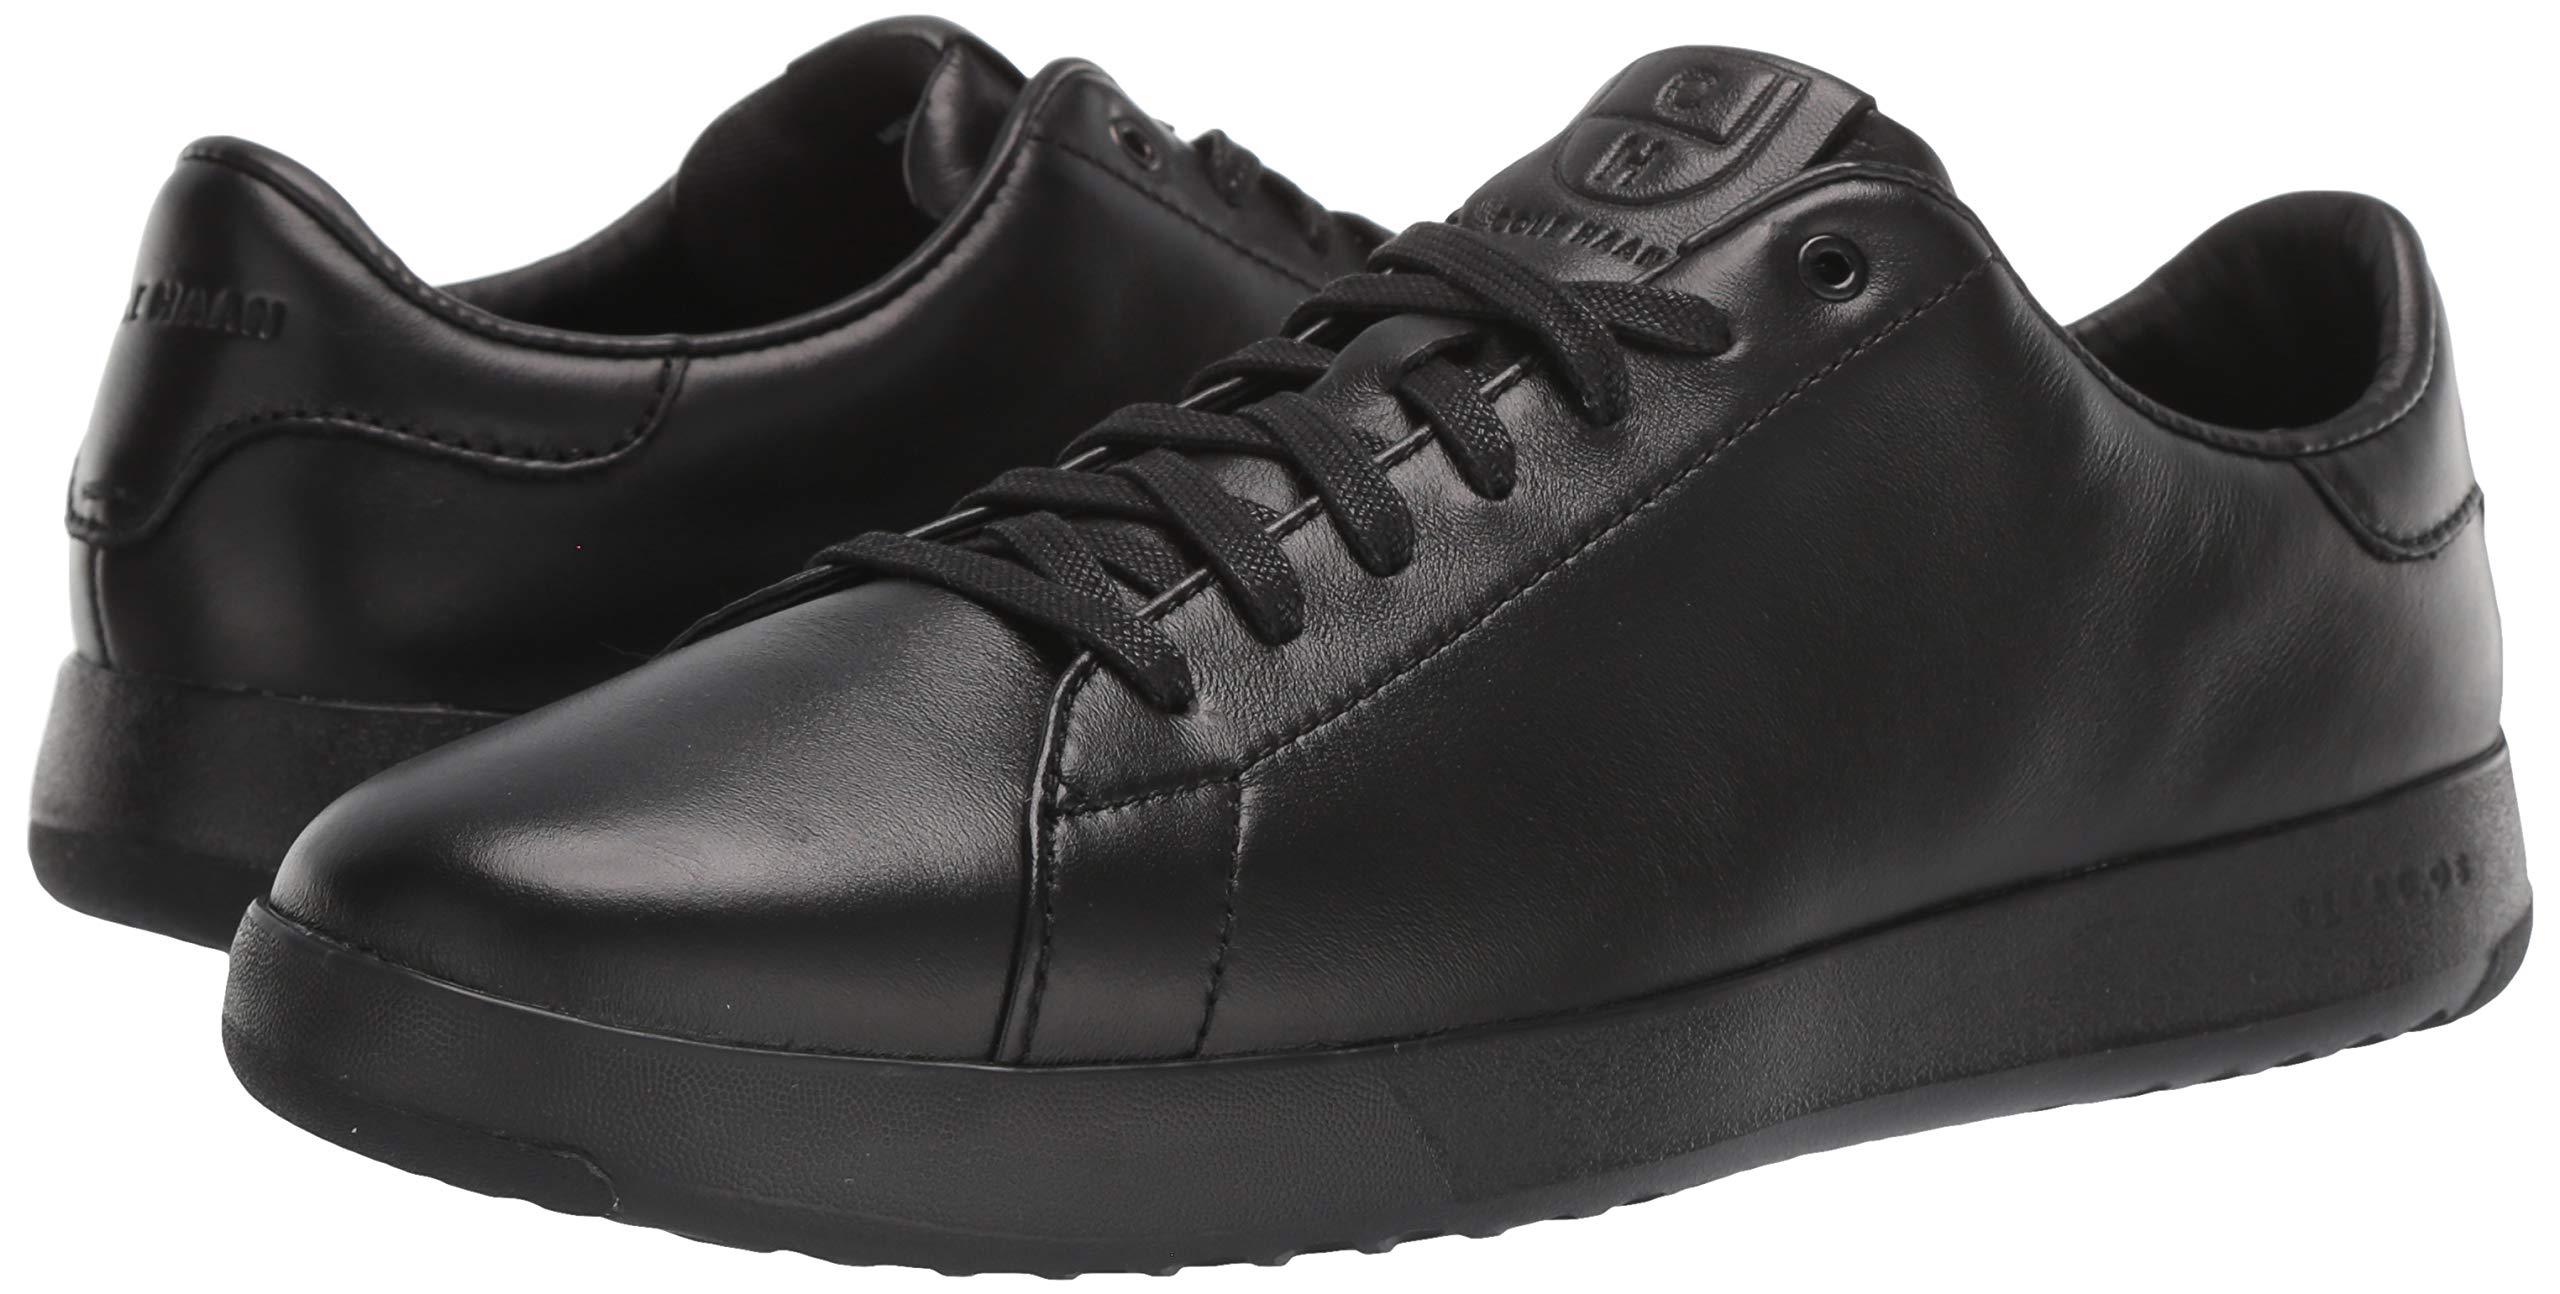 Cole Haan Men's Grandpro Tennis Fashion Sneaker, Black/British Tan, 7 M US by Cole Haan (Image #6)